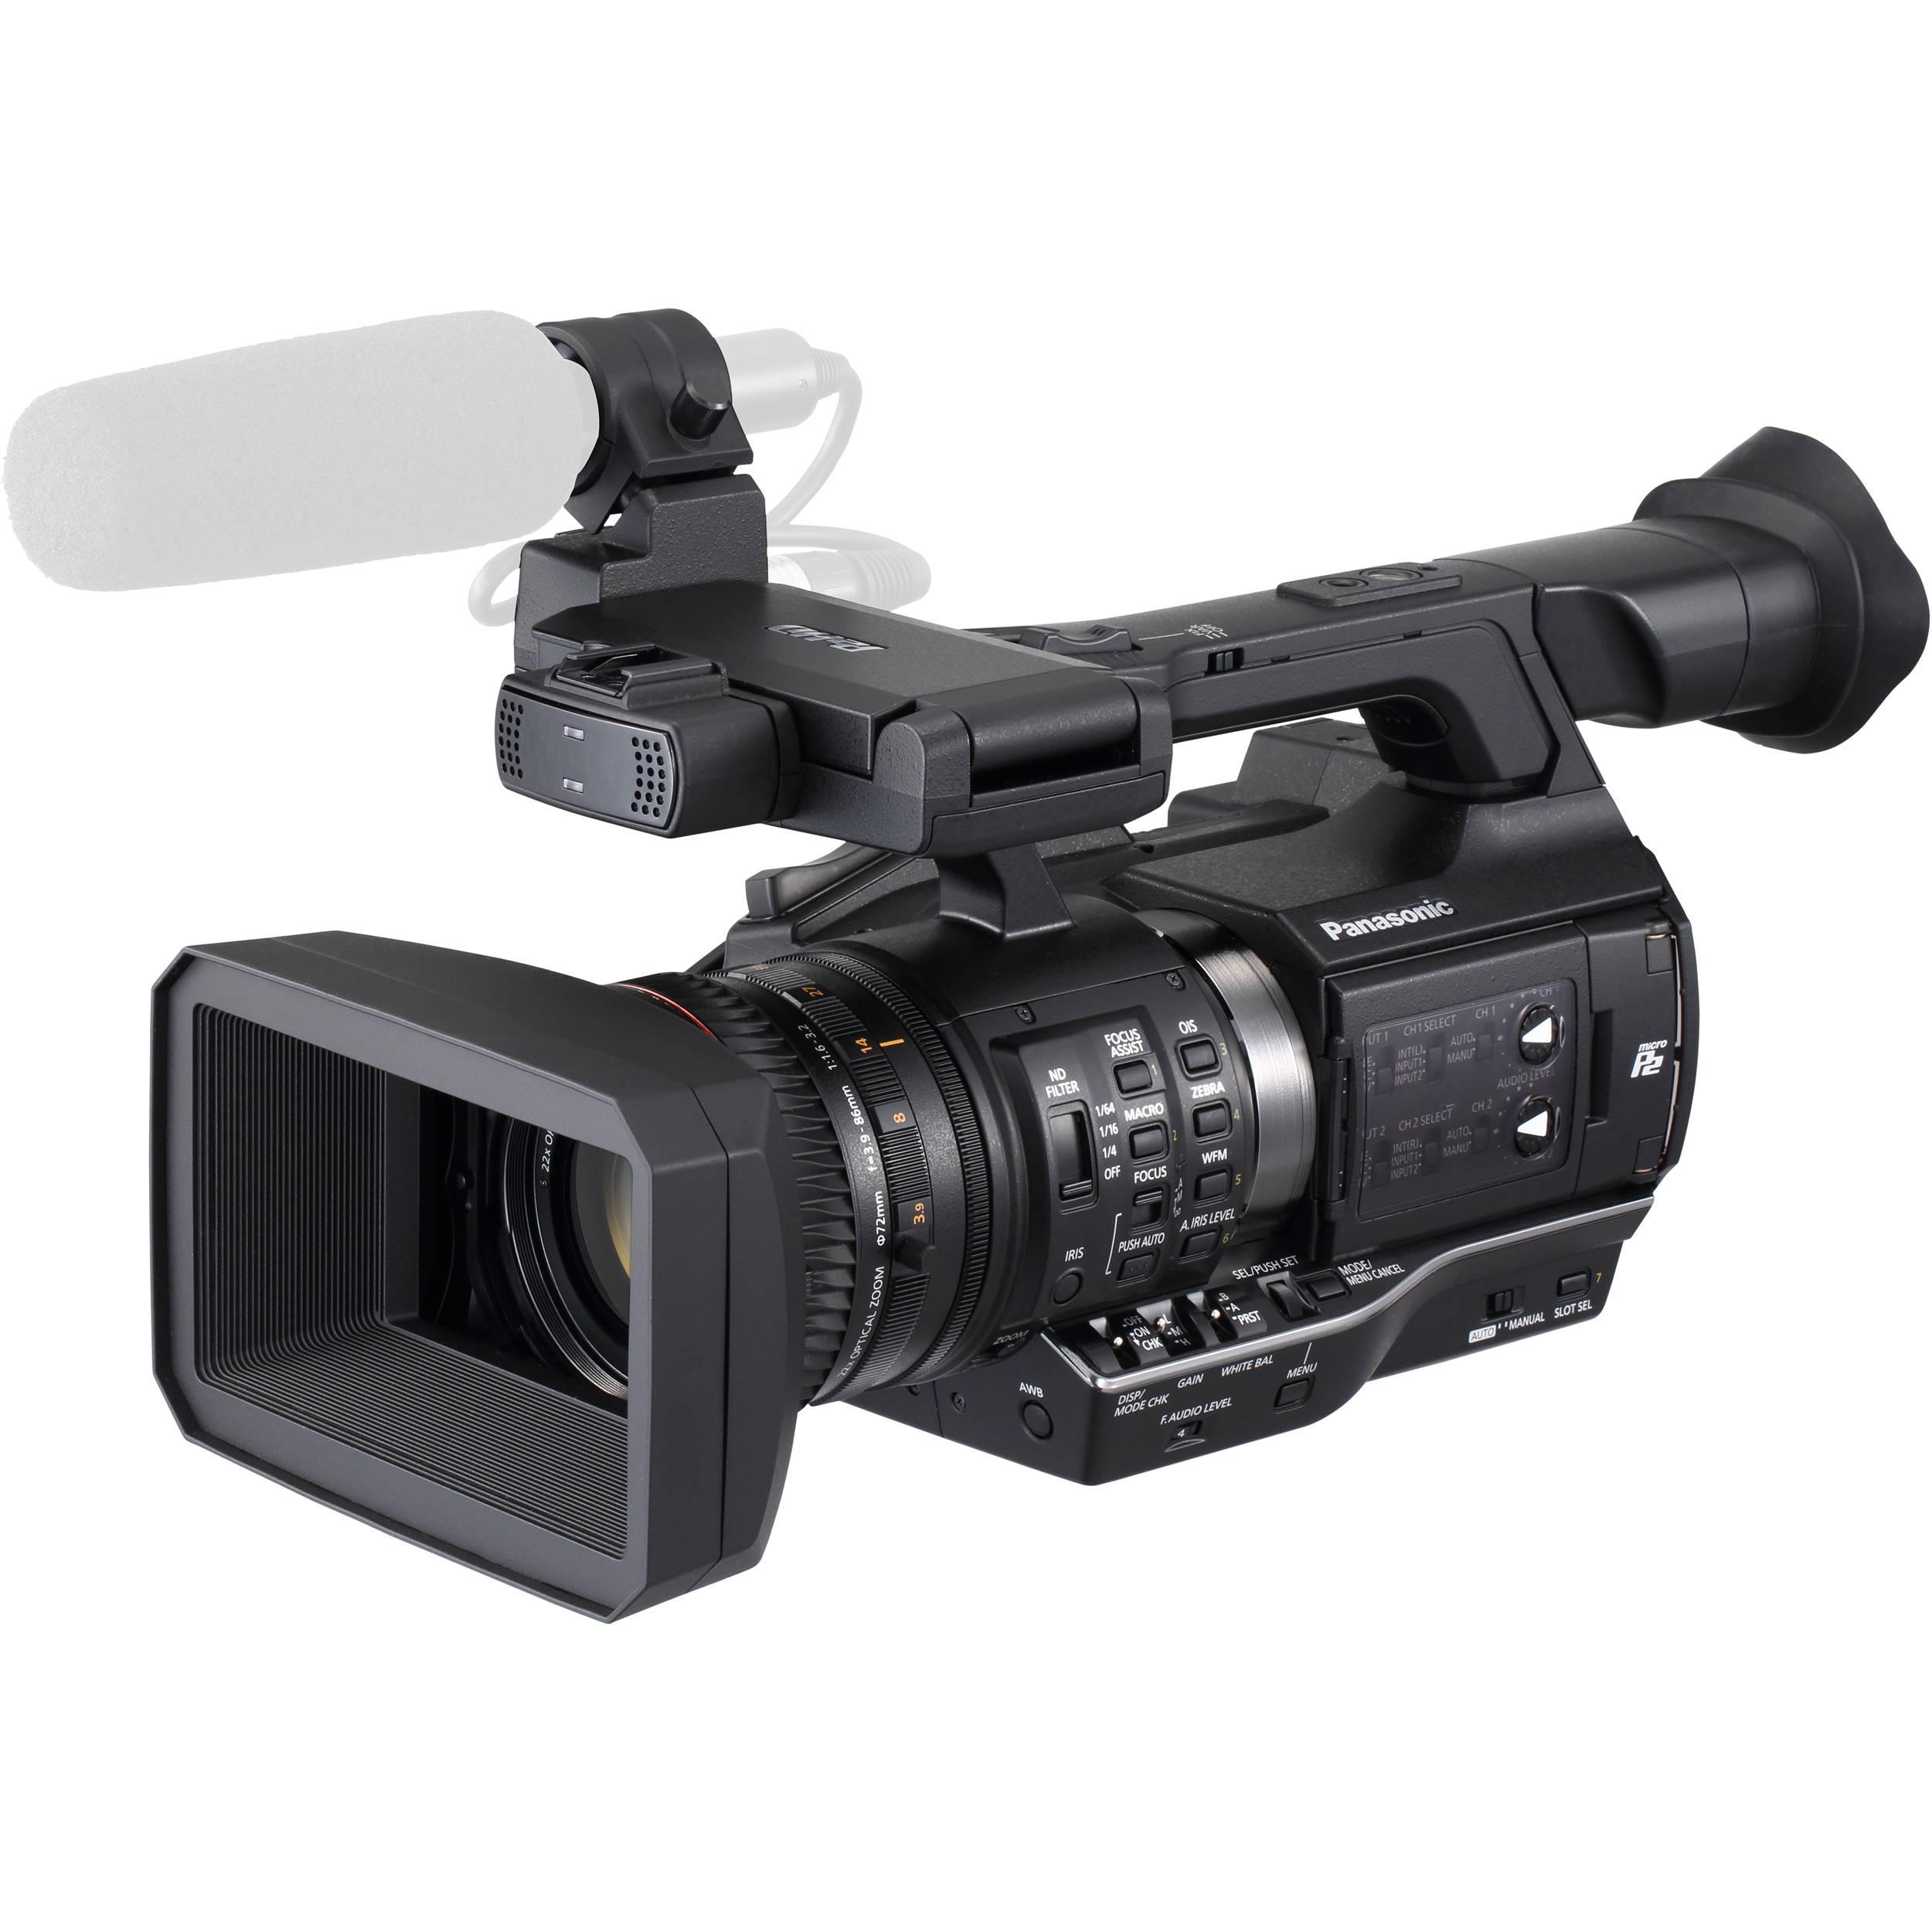 Panasonic AJ-PX230 microP2 AVC-Ultra Camcorder AJ-PX230PJ B&H